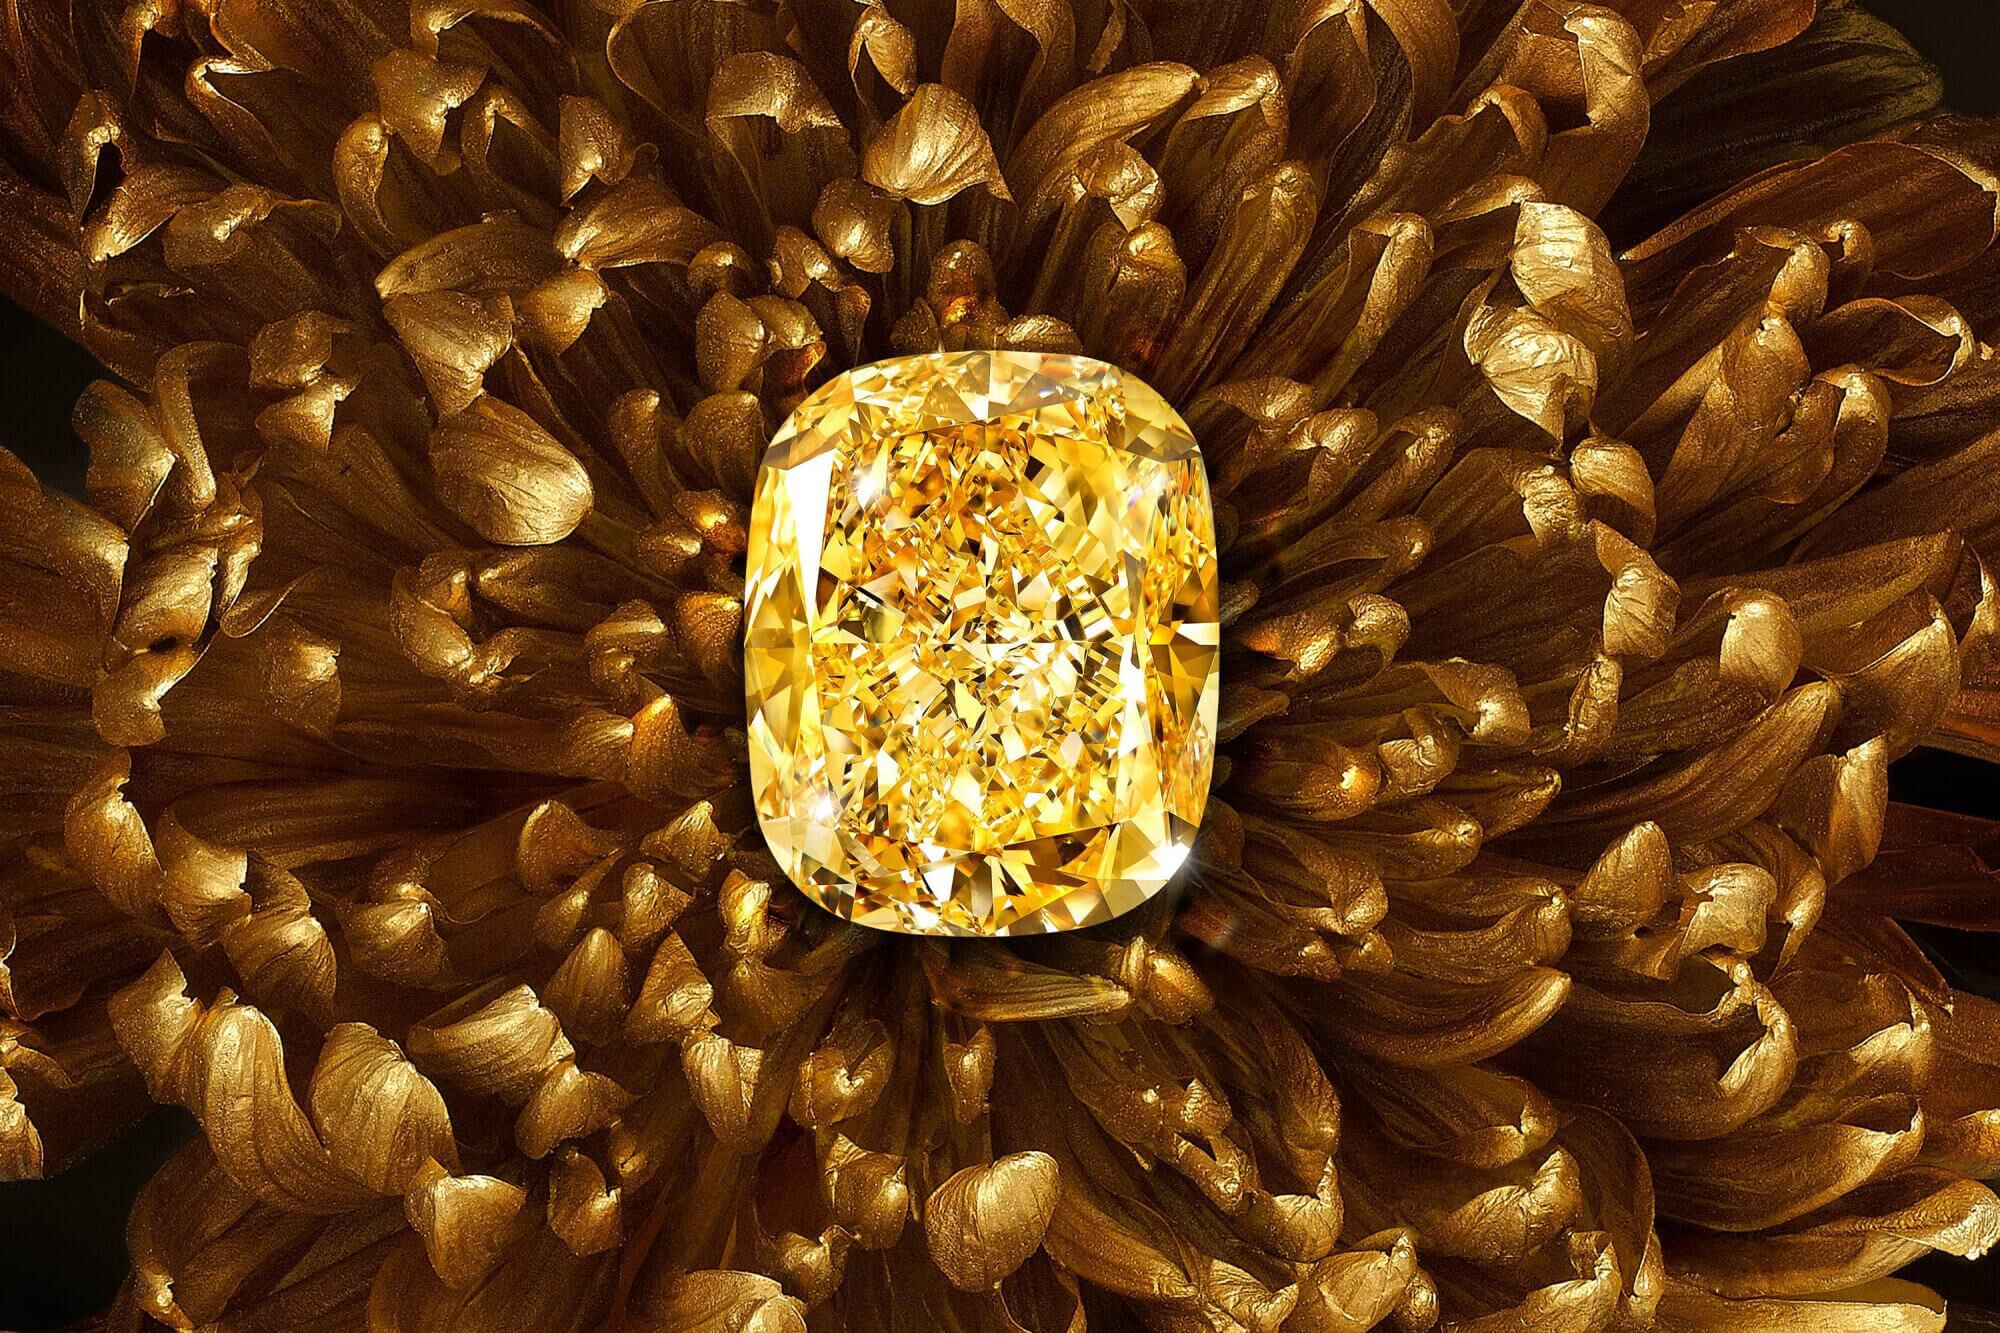 The famous Graff Golden Empress yellow diamond with a background of golden flower petals